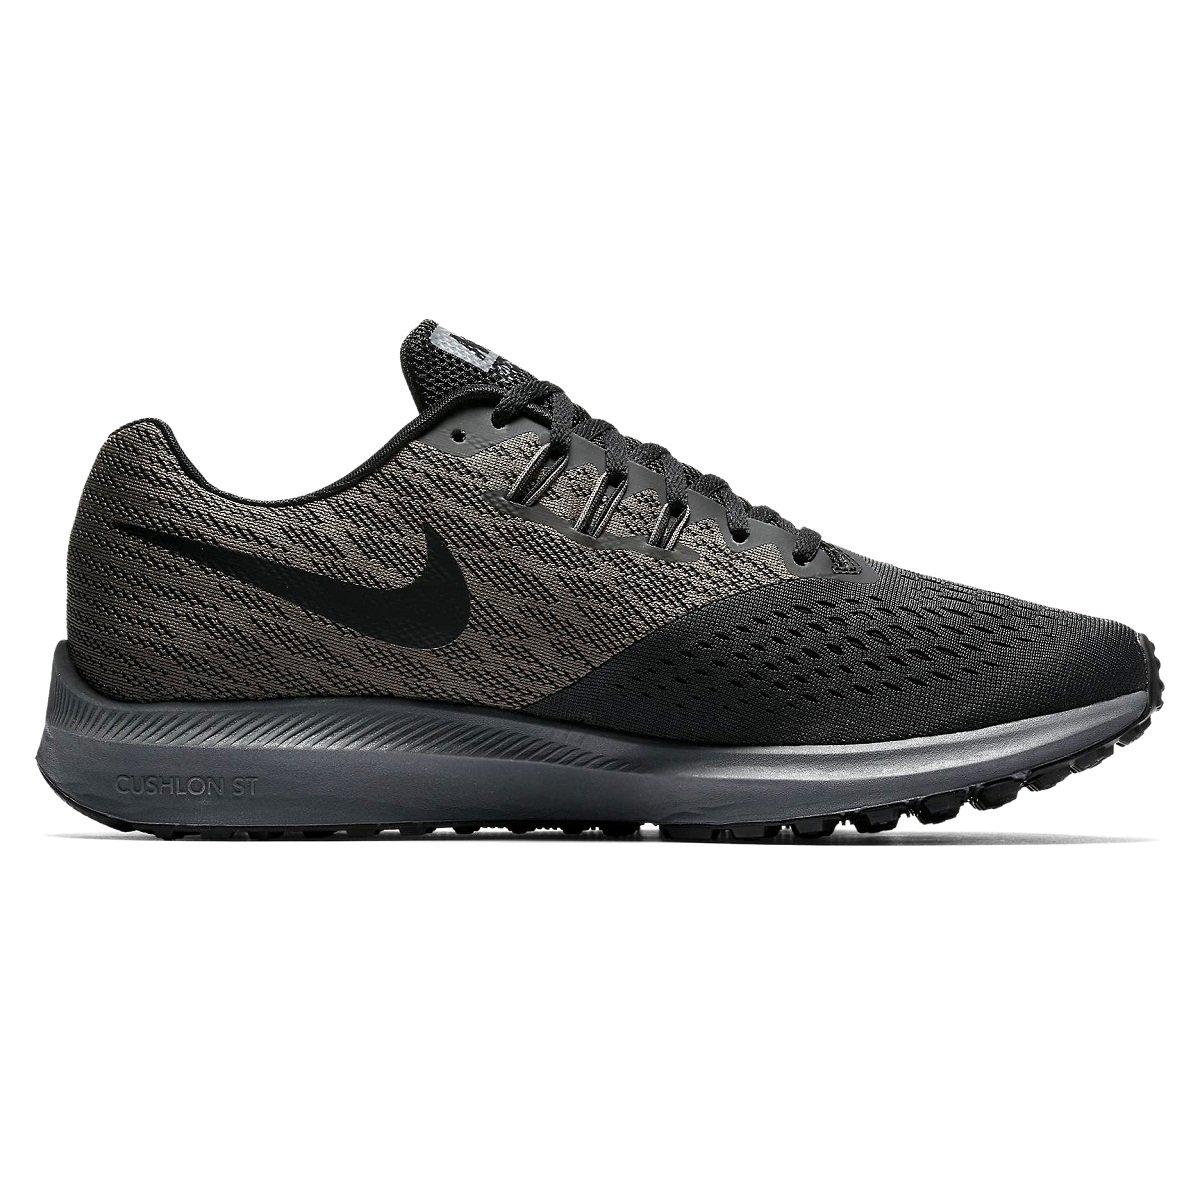 ea40c2519a1 Tênis Masculino Nike Zoom Winflo 4 898466-007 - Cinza Escuro ...